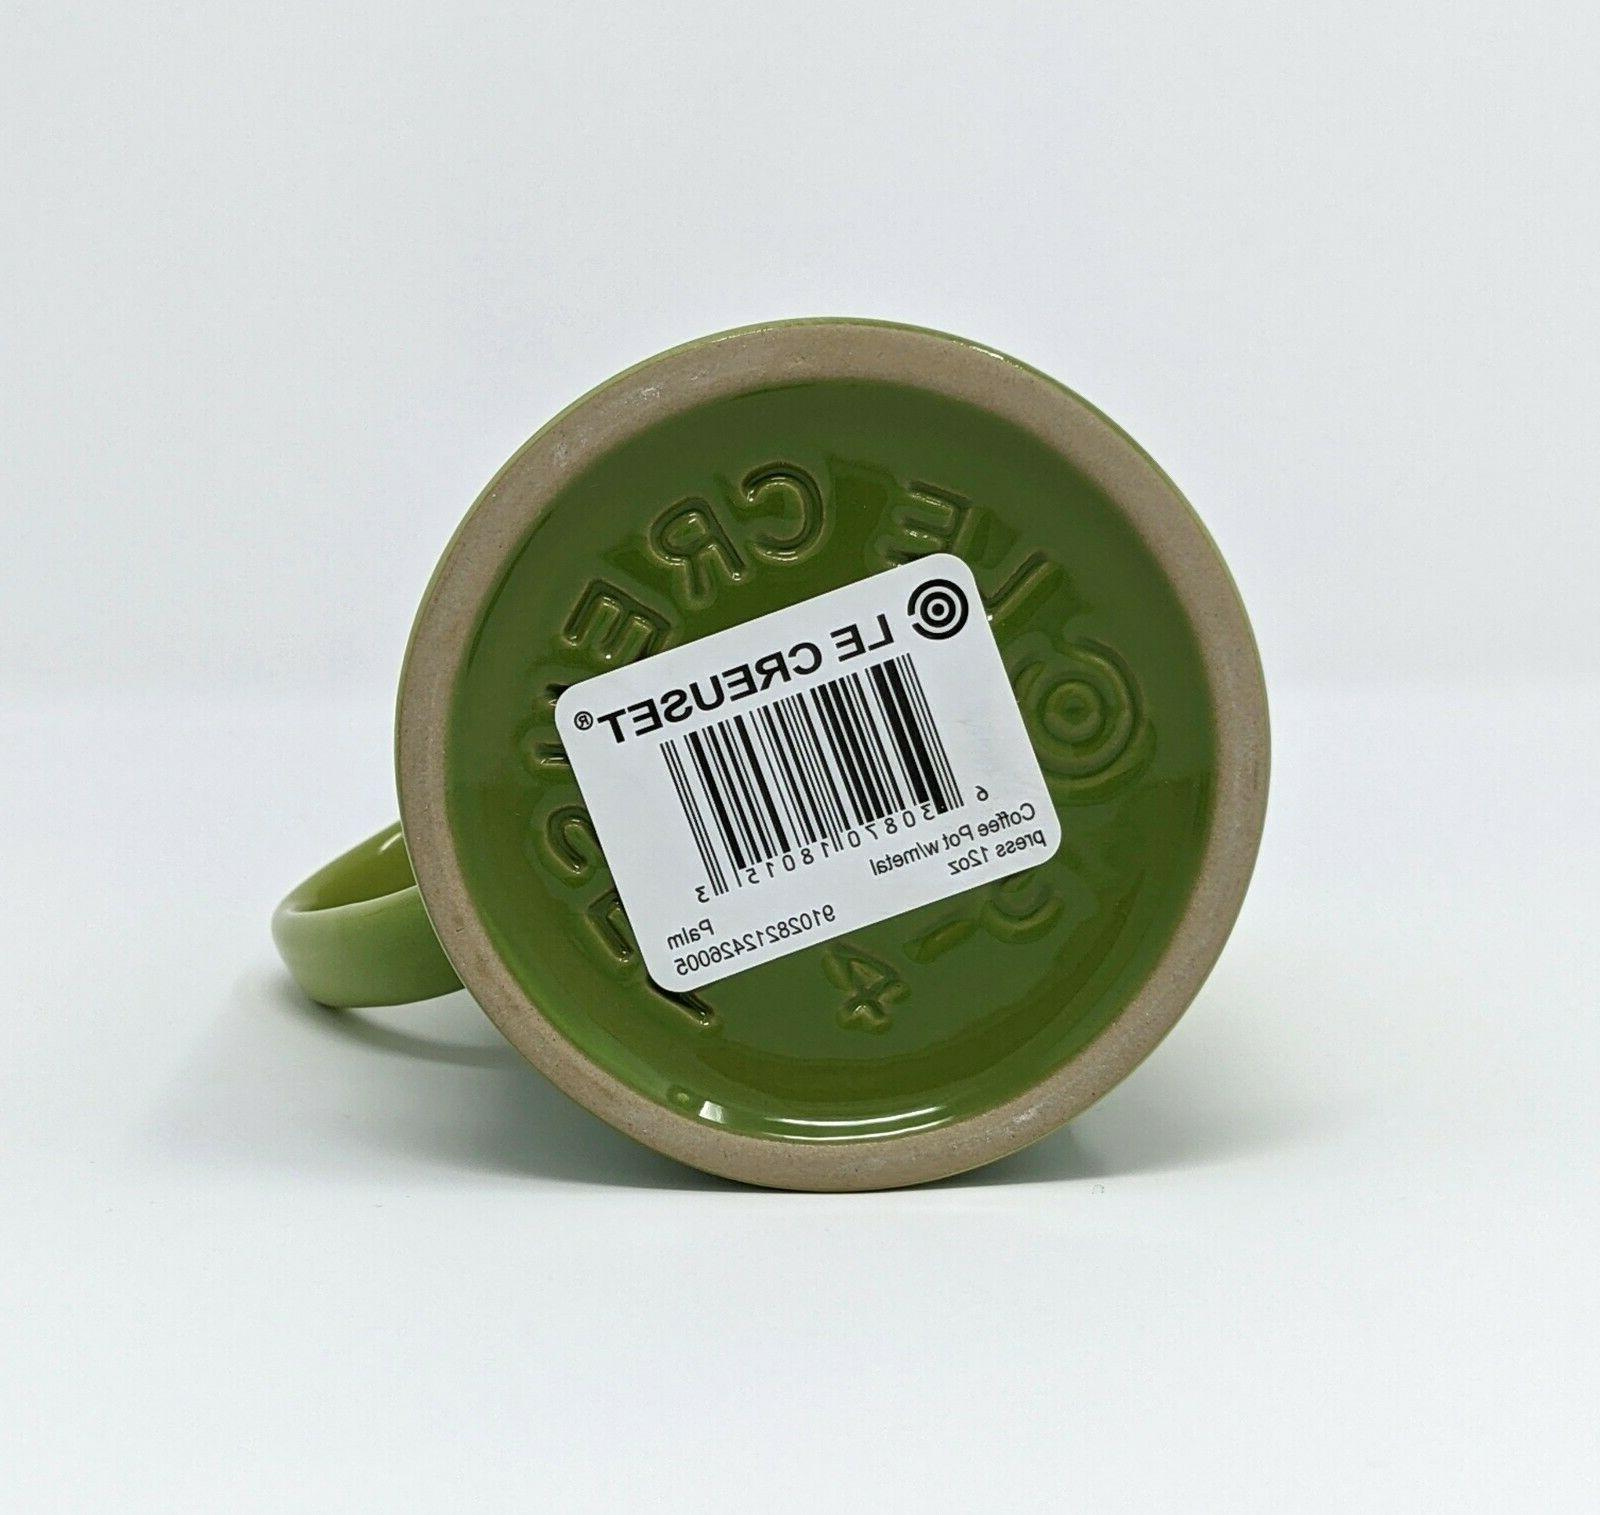 LE Press, 12oz Ceramic Palm Coffee NEW